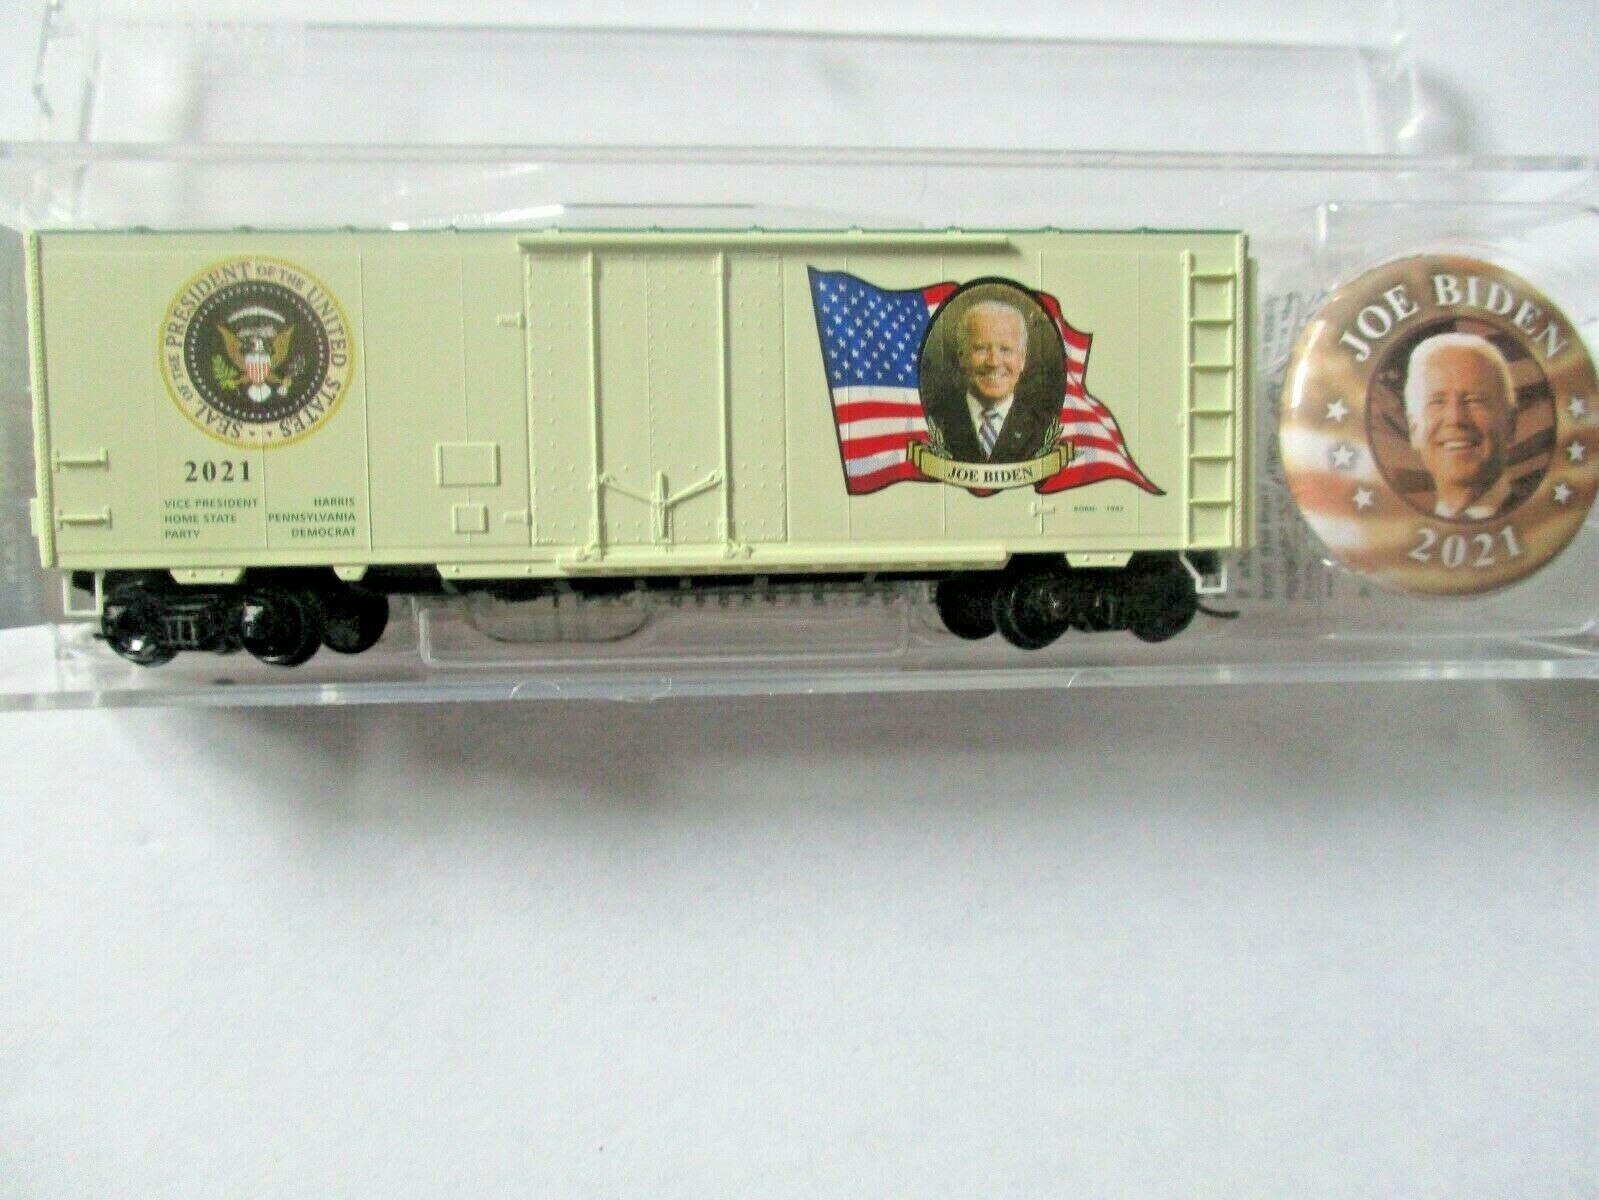 Micro-Trains # 07400146 Joe Biden Presidential 40' Boxcar Road # 2021. N-Scale